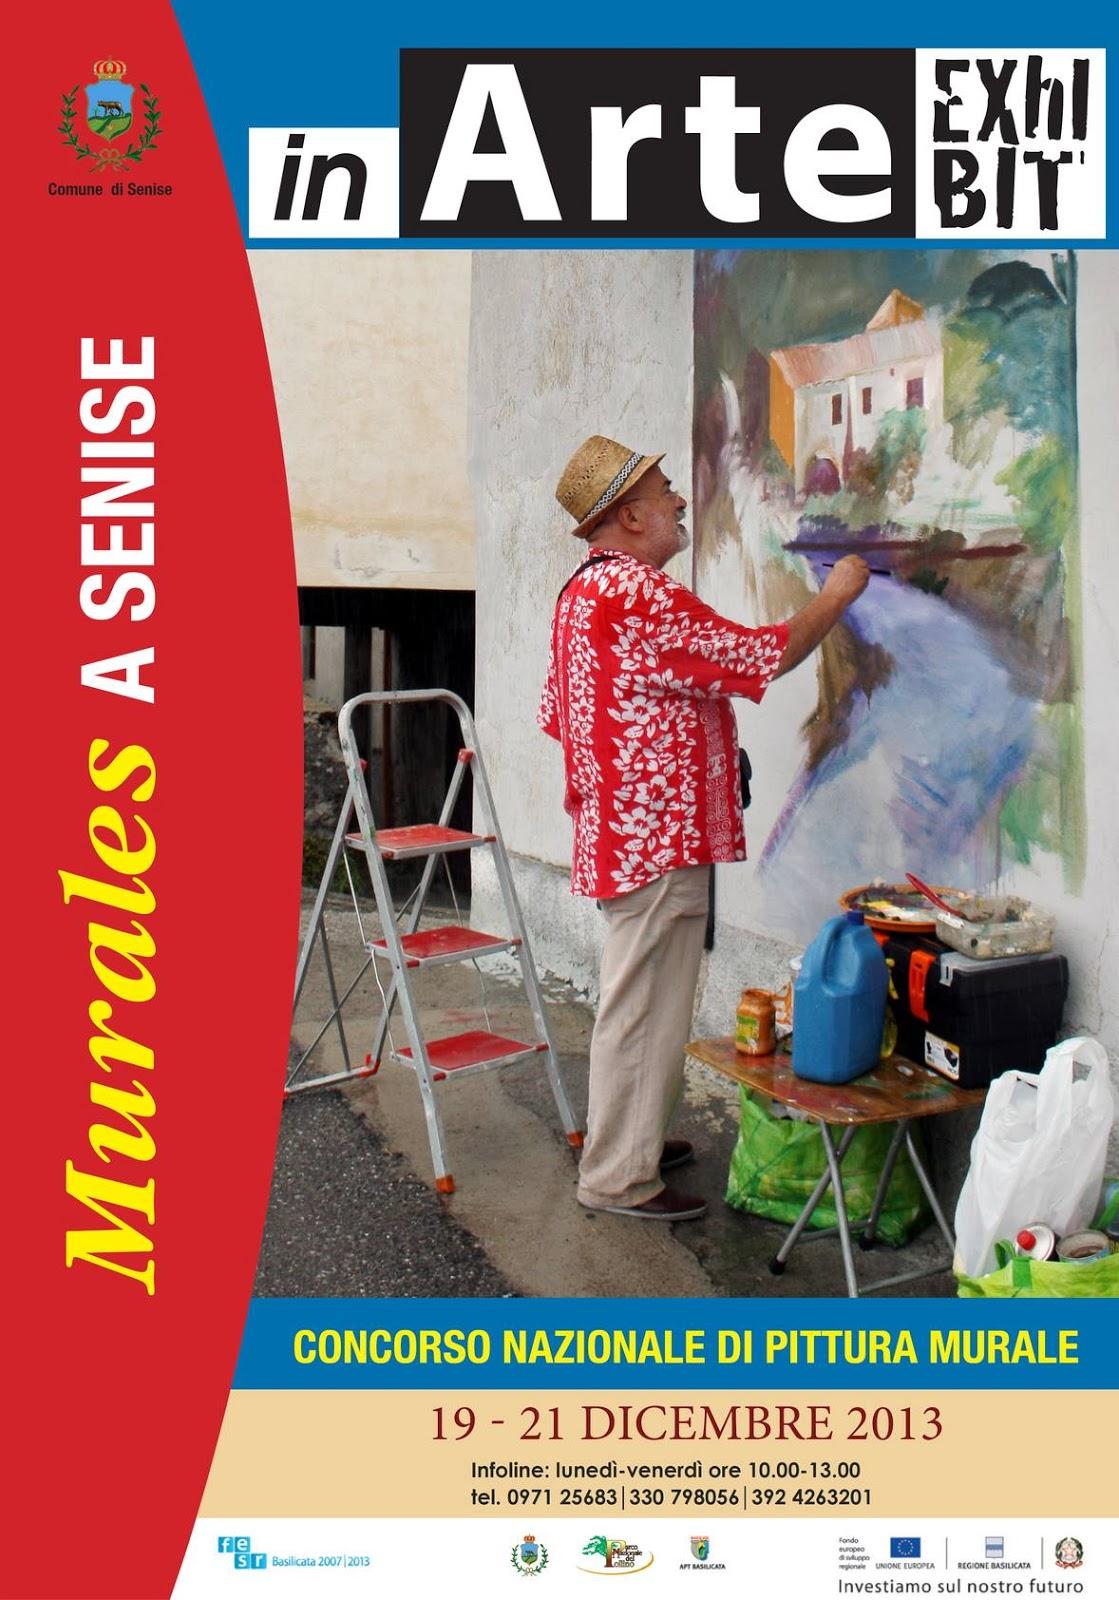 http://inarte-blog.blogspot.it/2013/12/murales-senise-storia-e-tradizioni.html